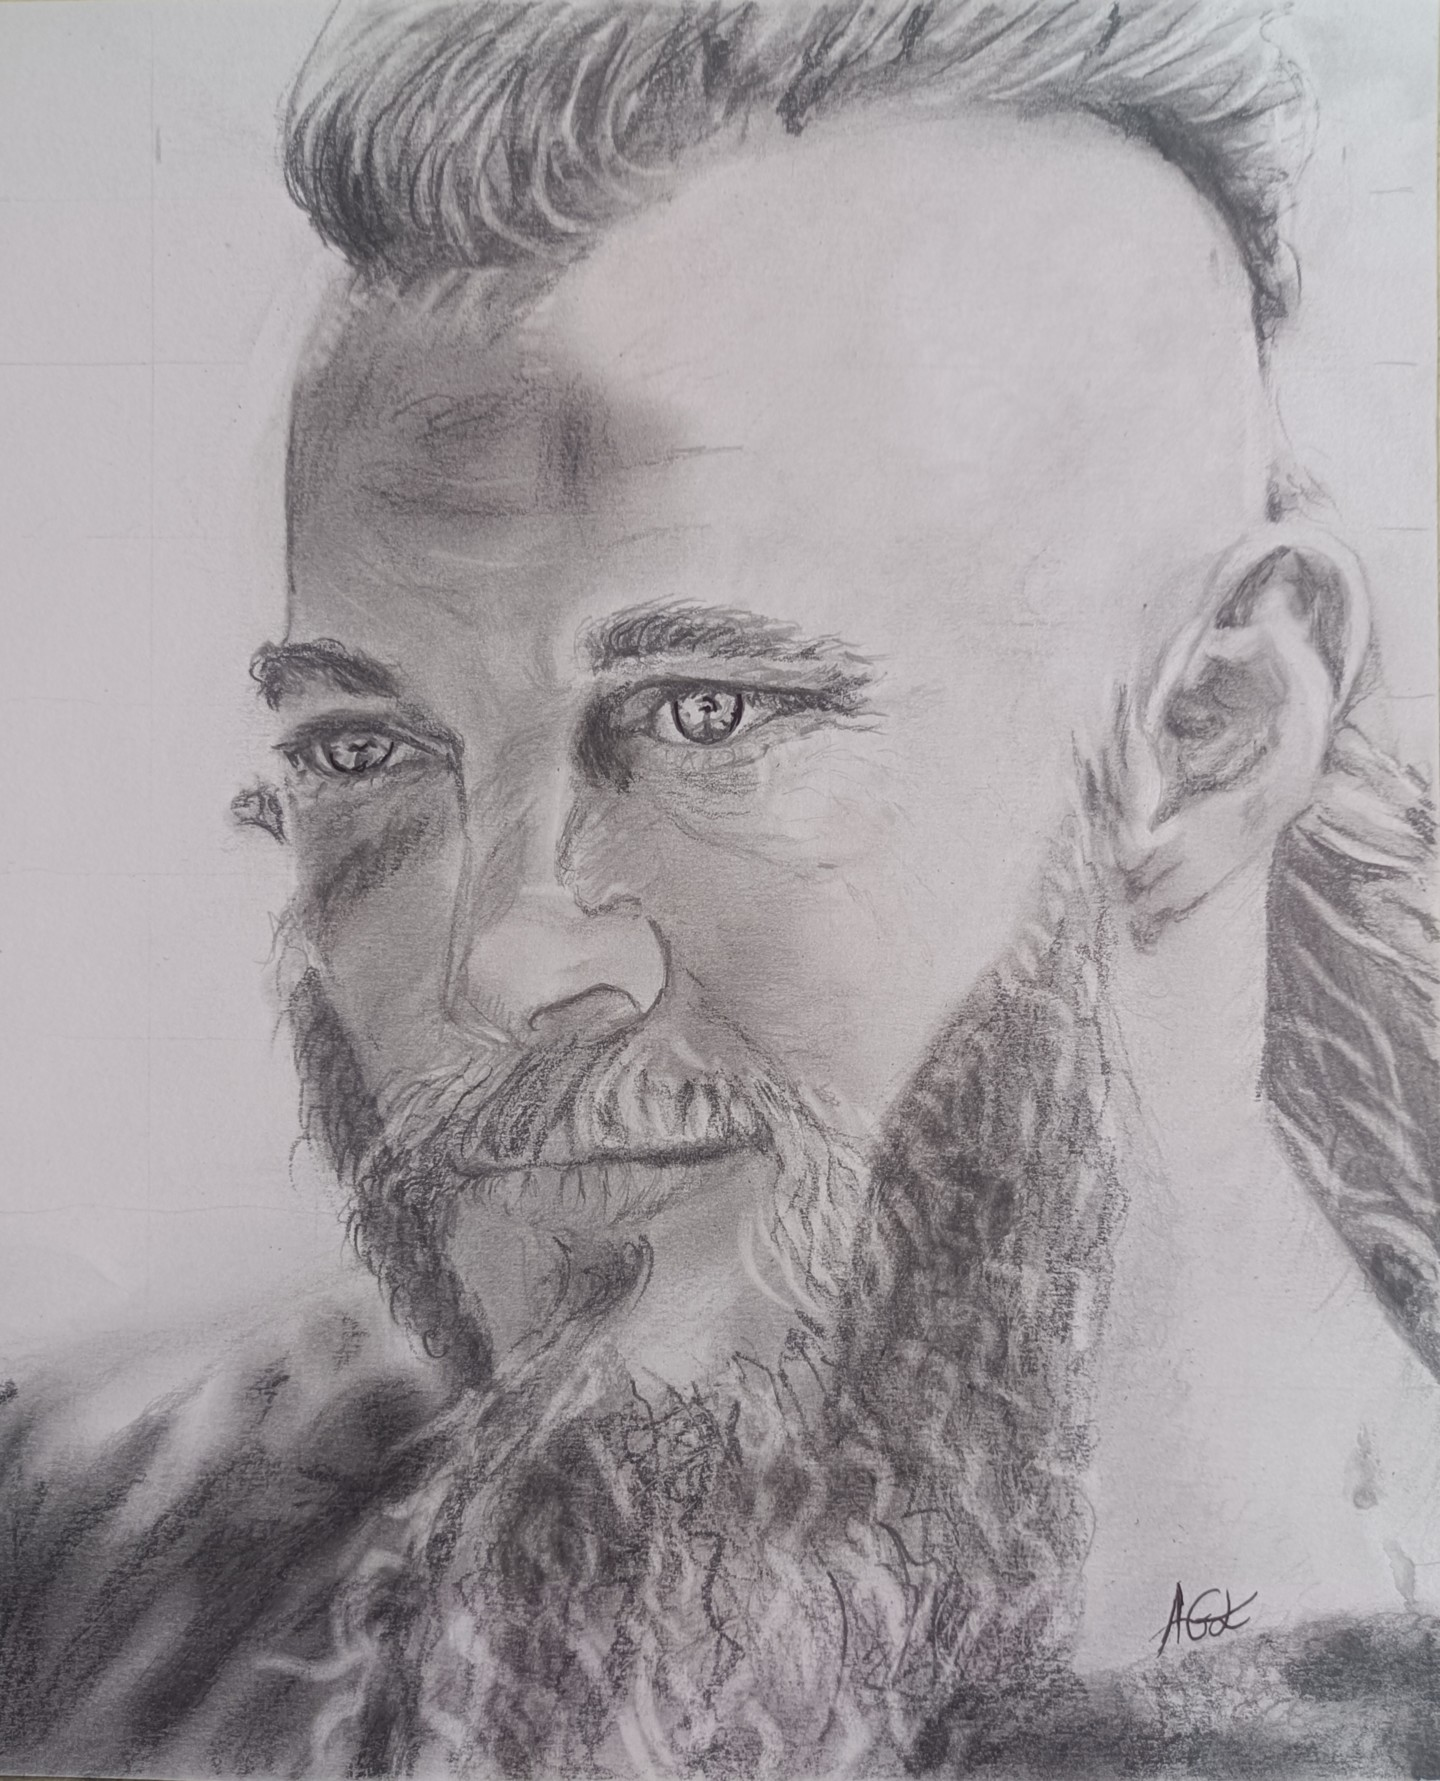 Agl - Art viking